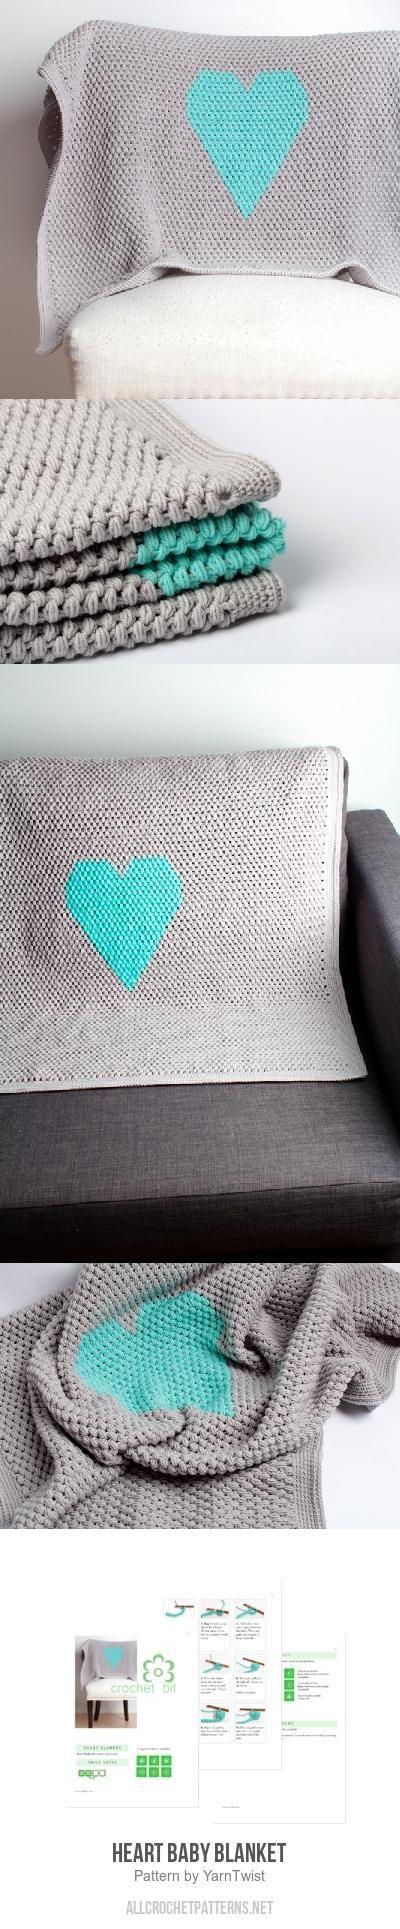 Heart Baby Blanket crochet pattern by YarnTwist | Manta y Camas